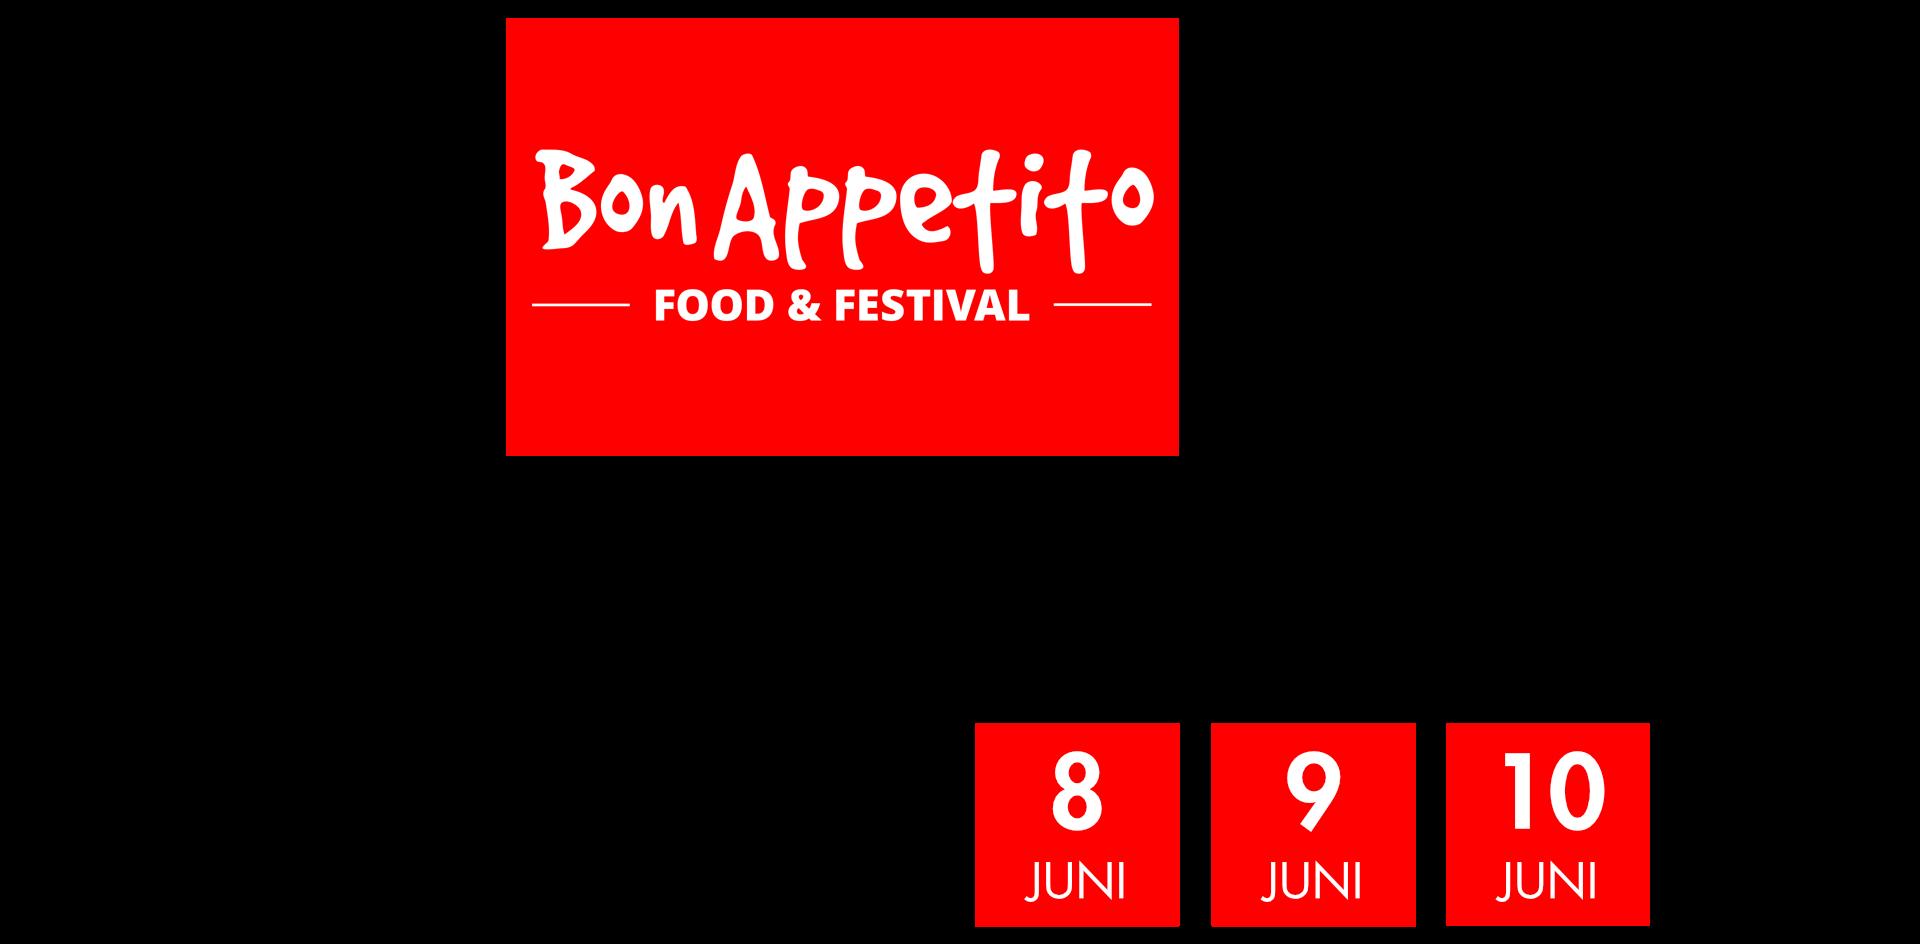 BonAppetito Houten 2018